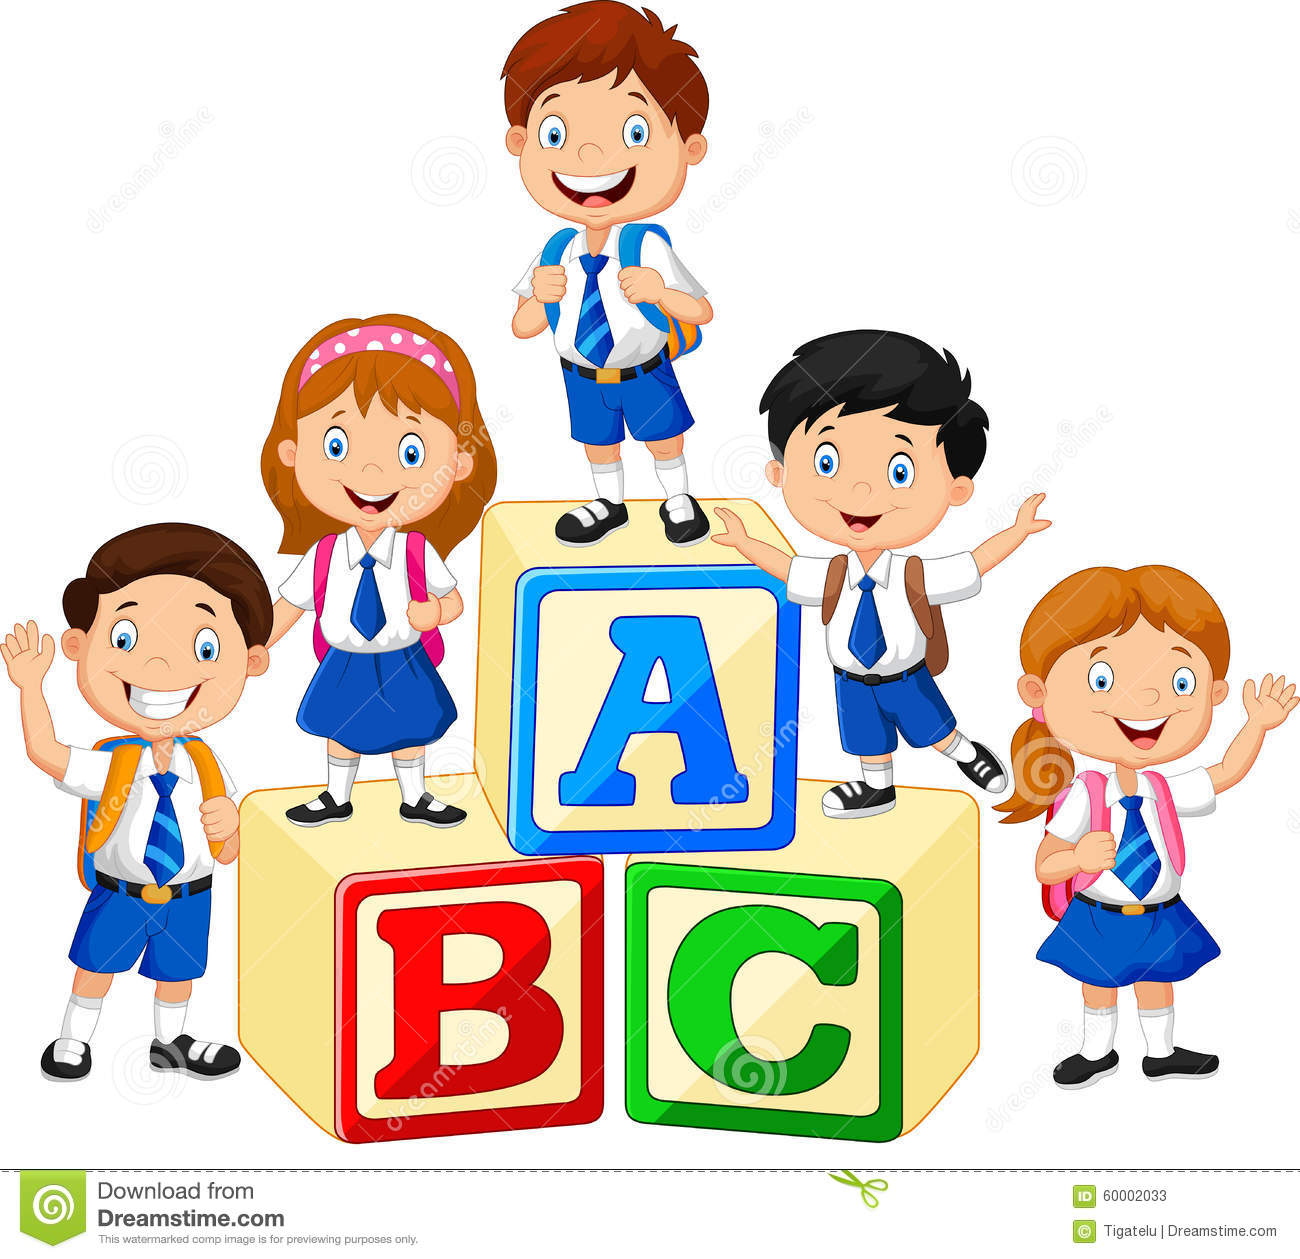 Alphabet clipart for kids. School children clipartfest happy